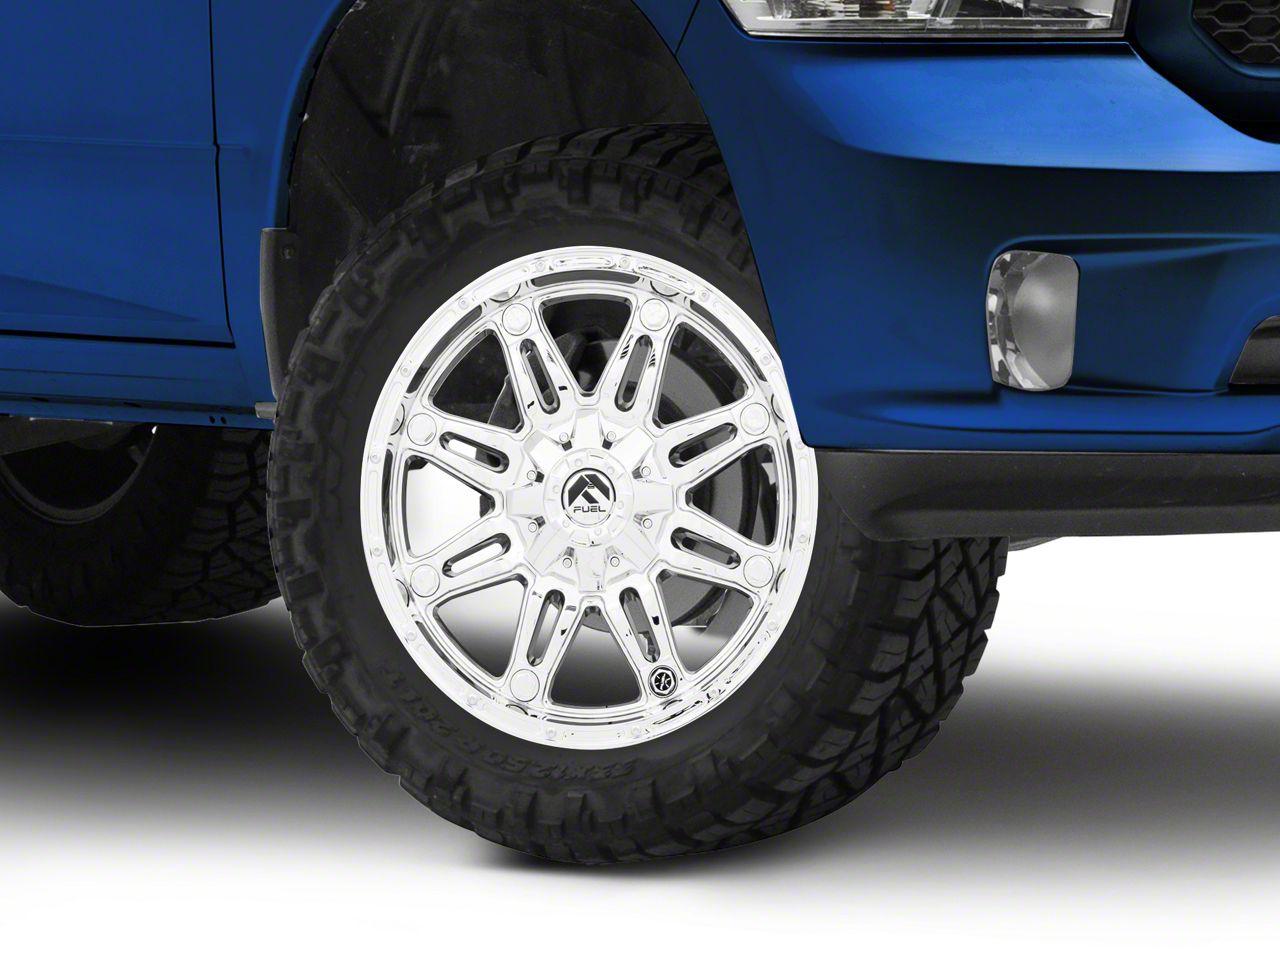 Fuel Wheels Hostage Chrome 5-Lug Wheel - 20x9 (02-18 RAM 1500, Excluding Mega Cab)